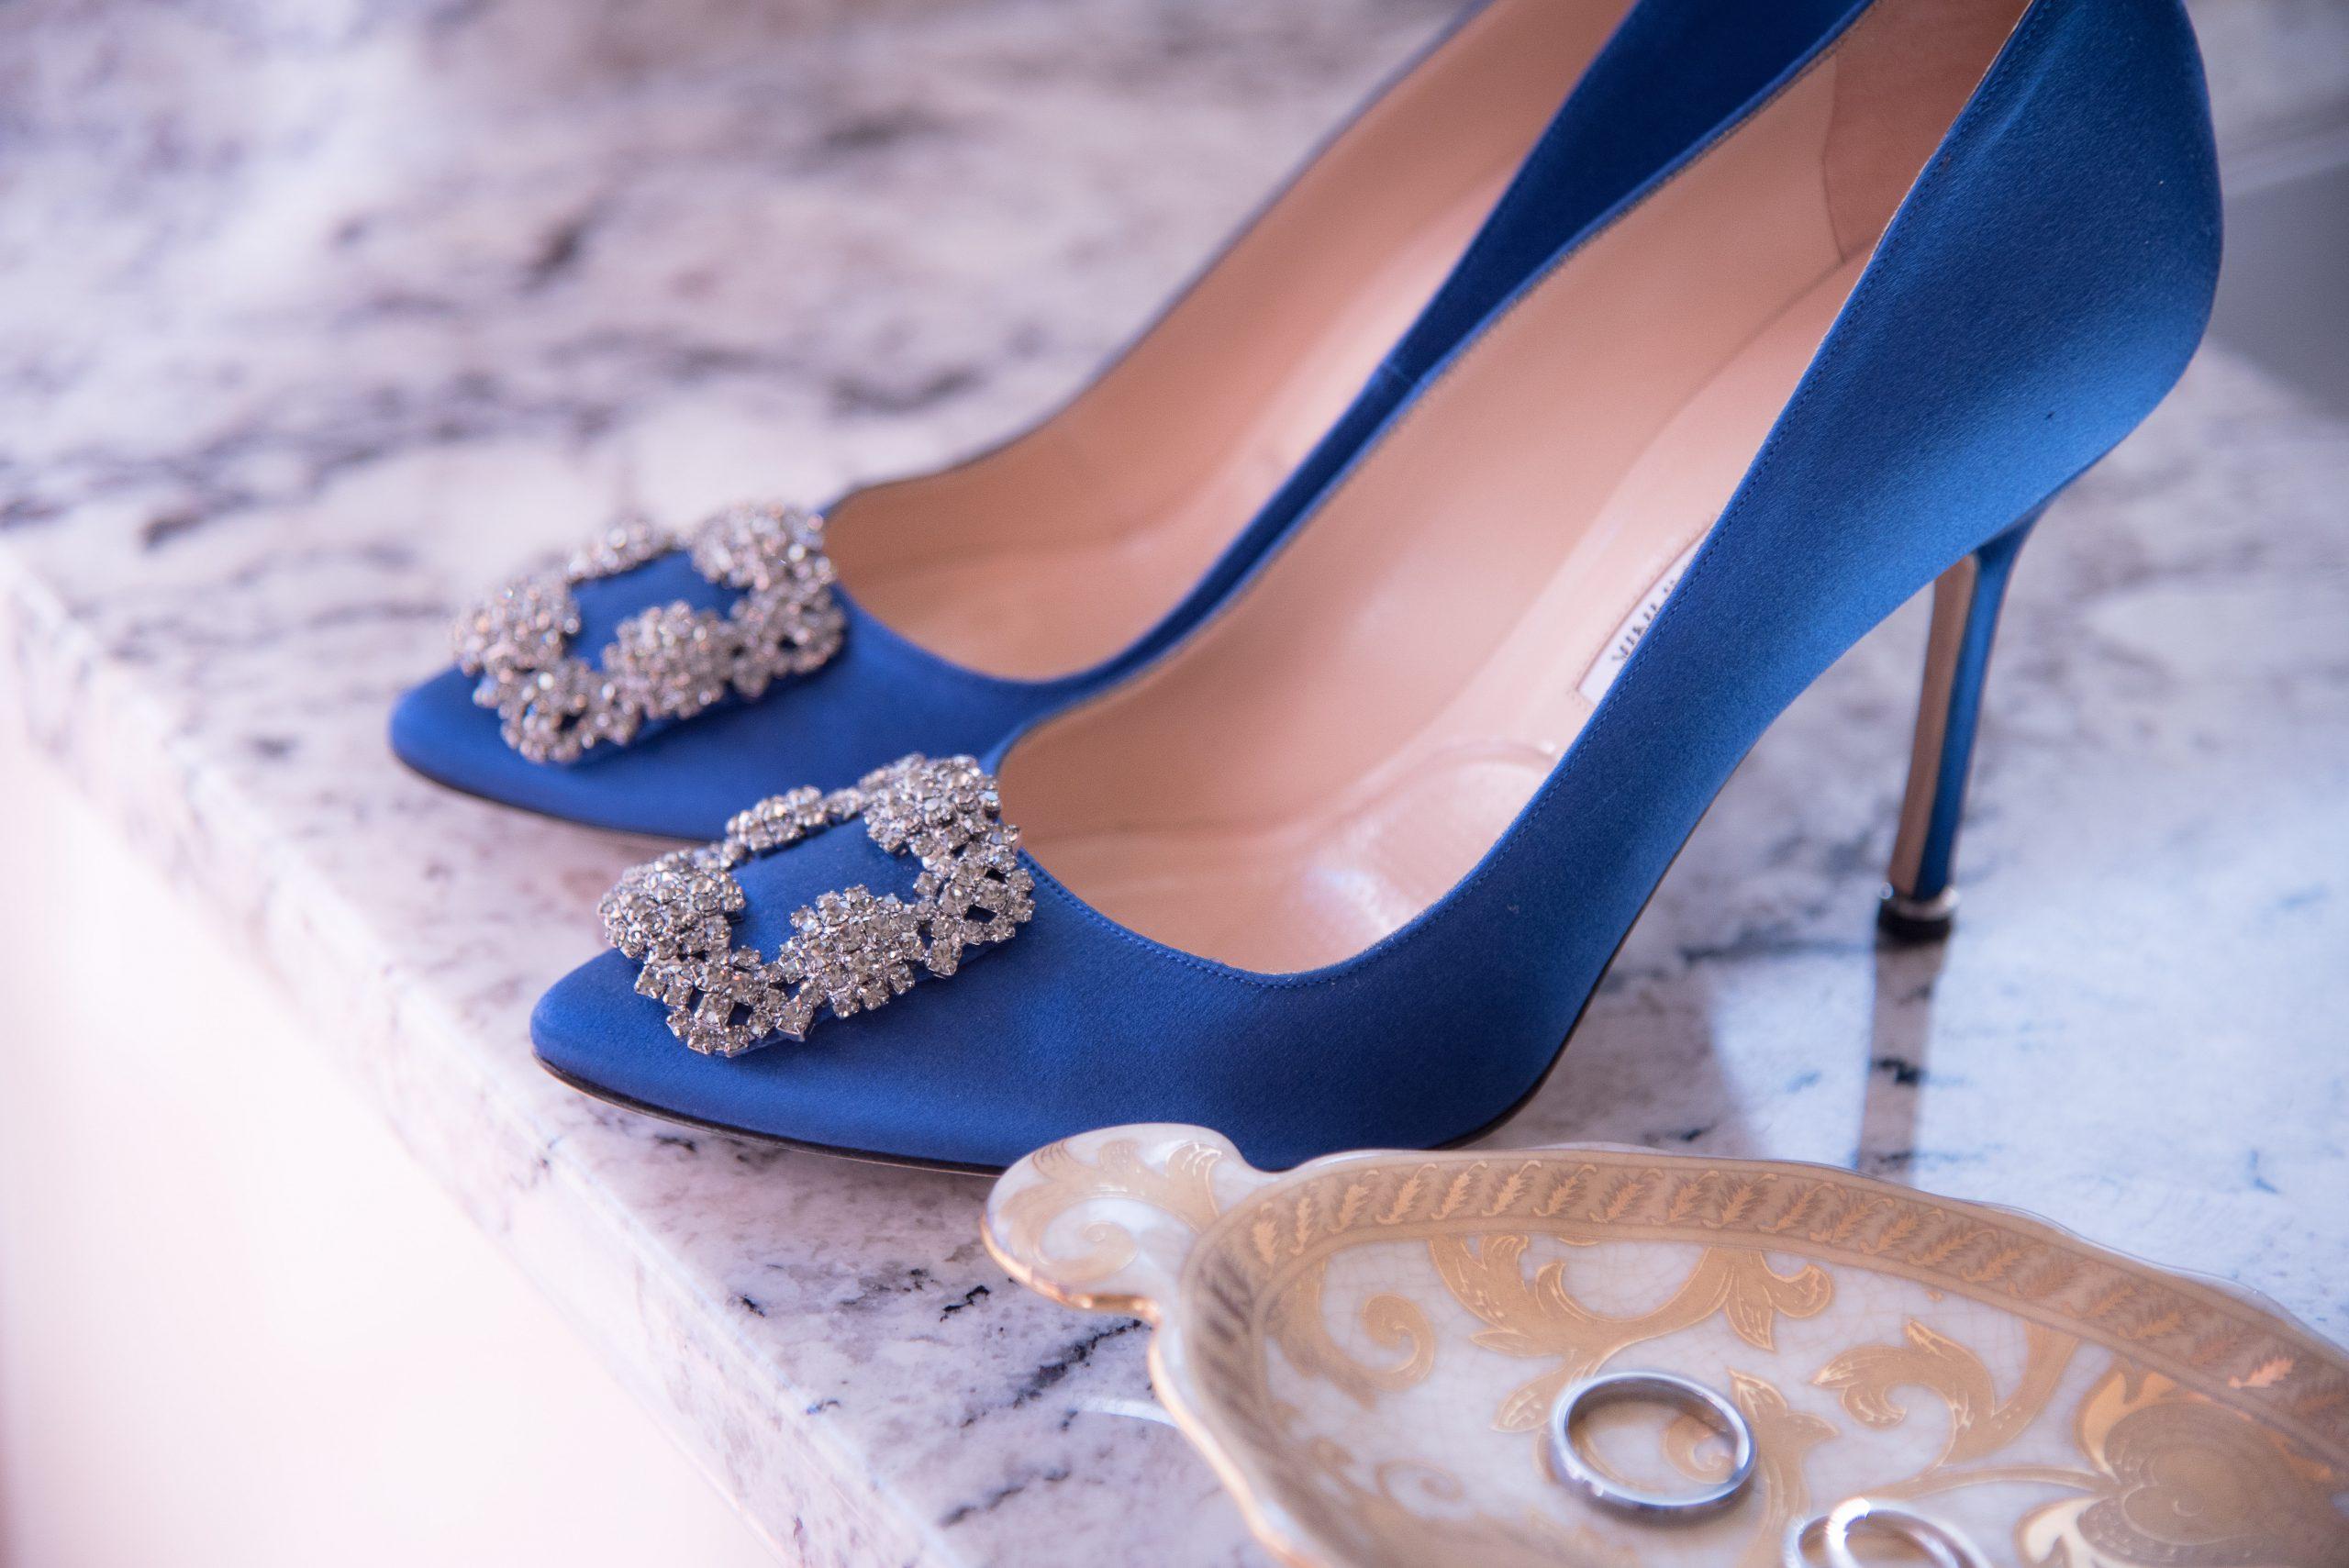 Pantofi mireasa albastri Carrie Bradshaw Manolo Blahnik Sursa Shutterstock